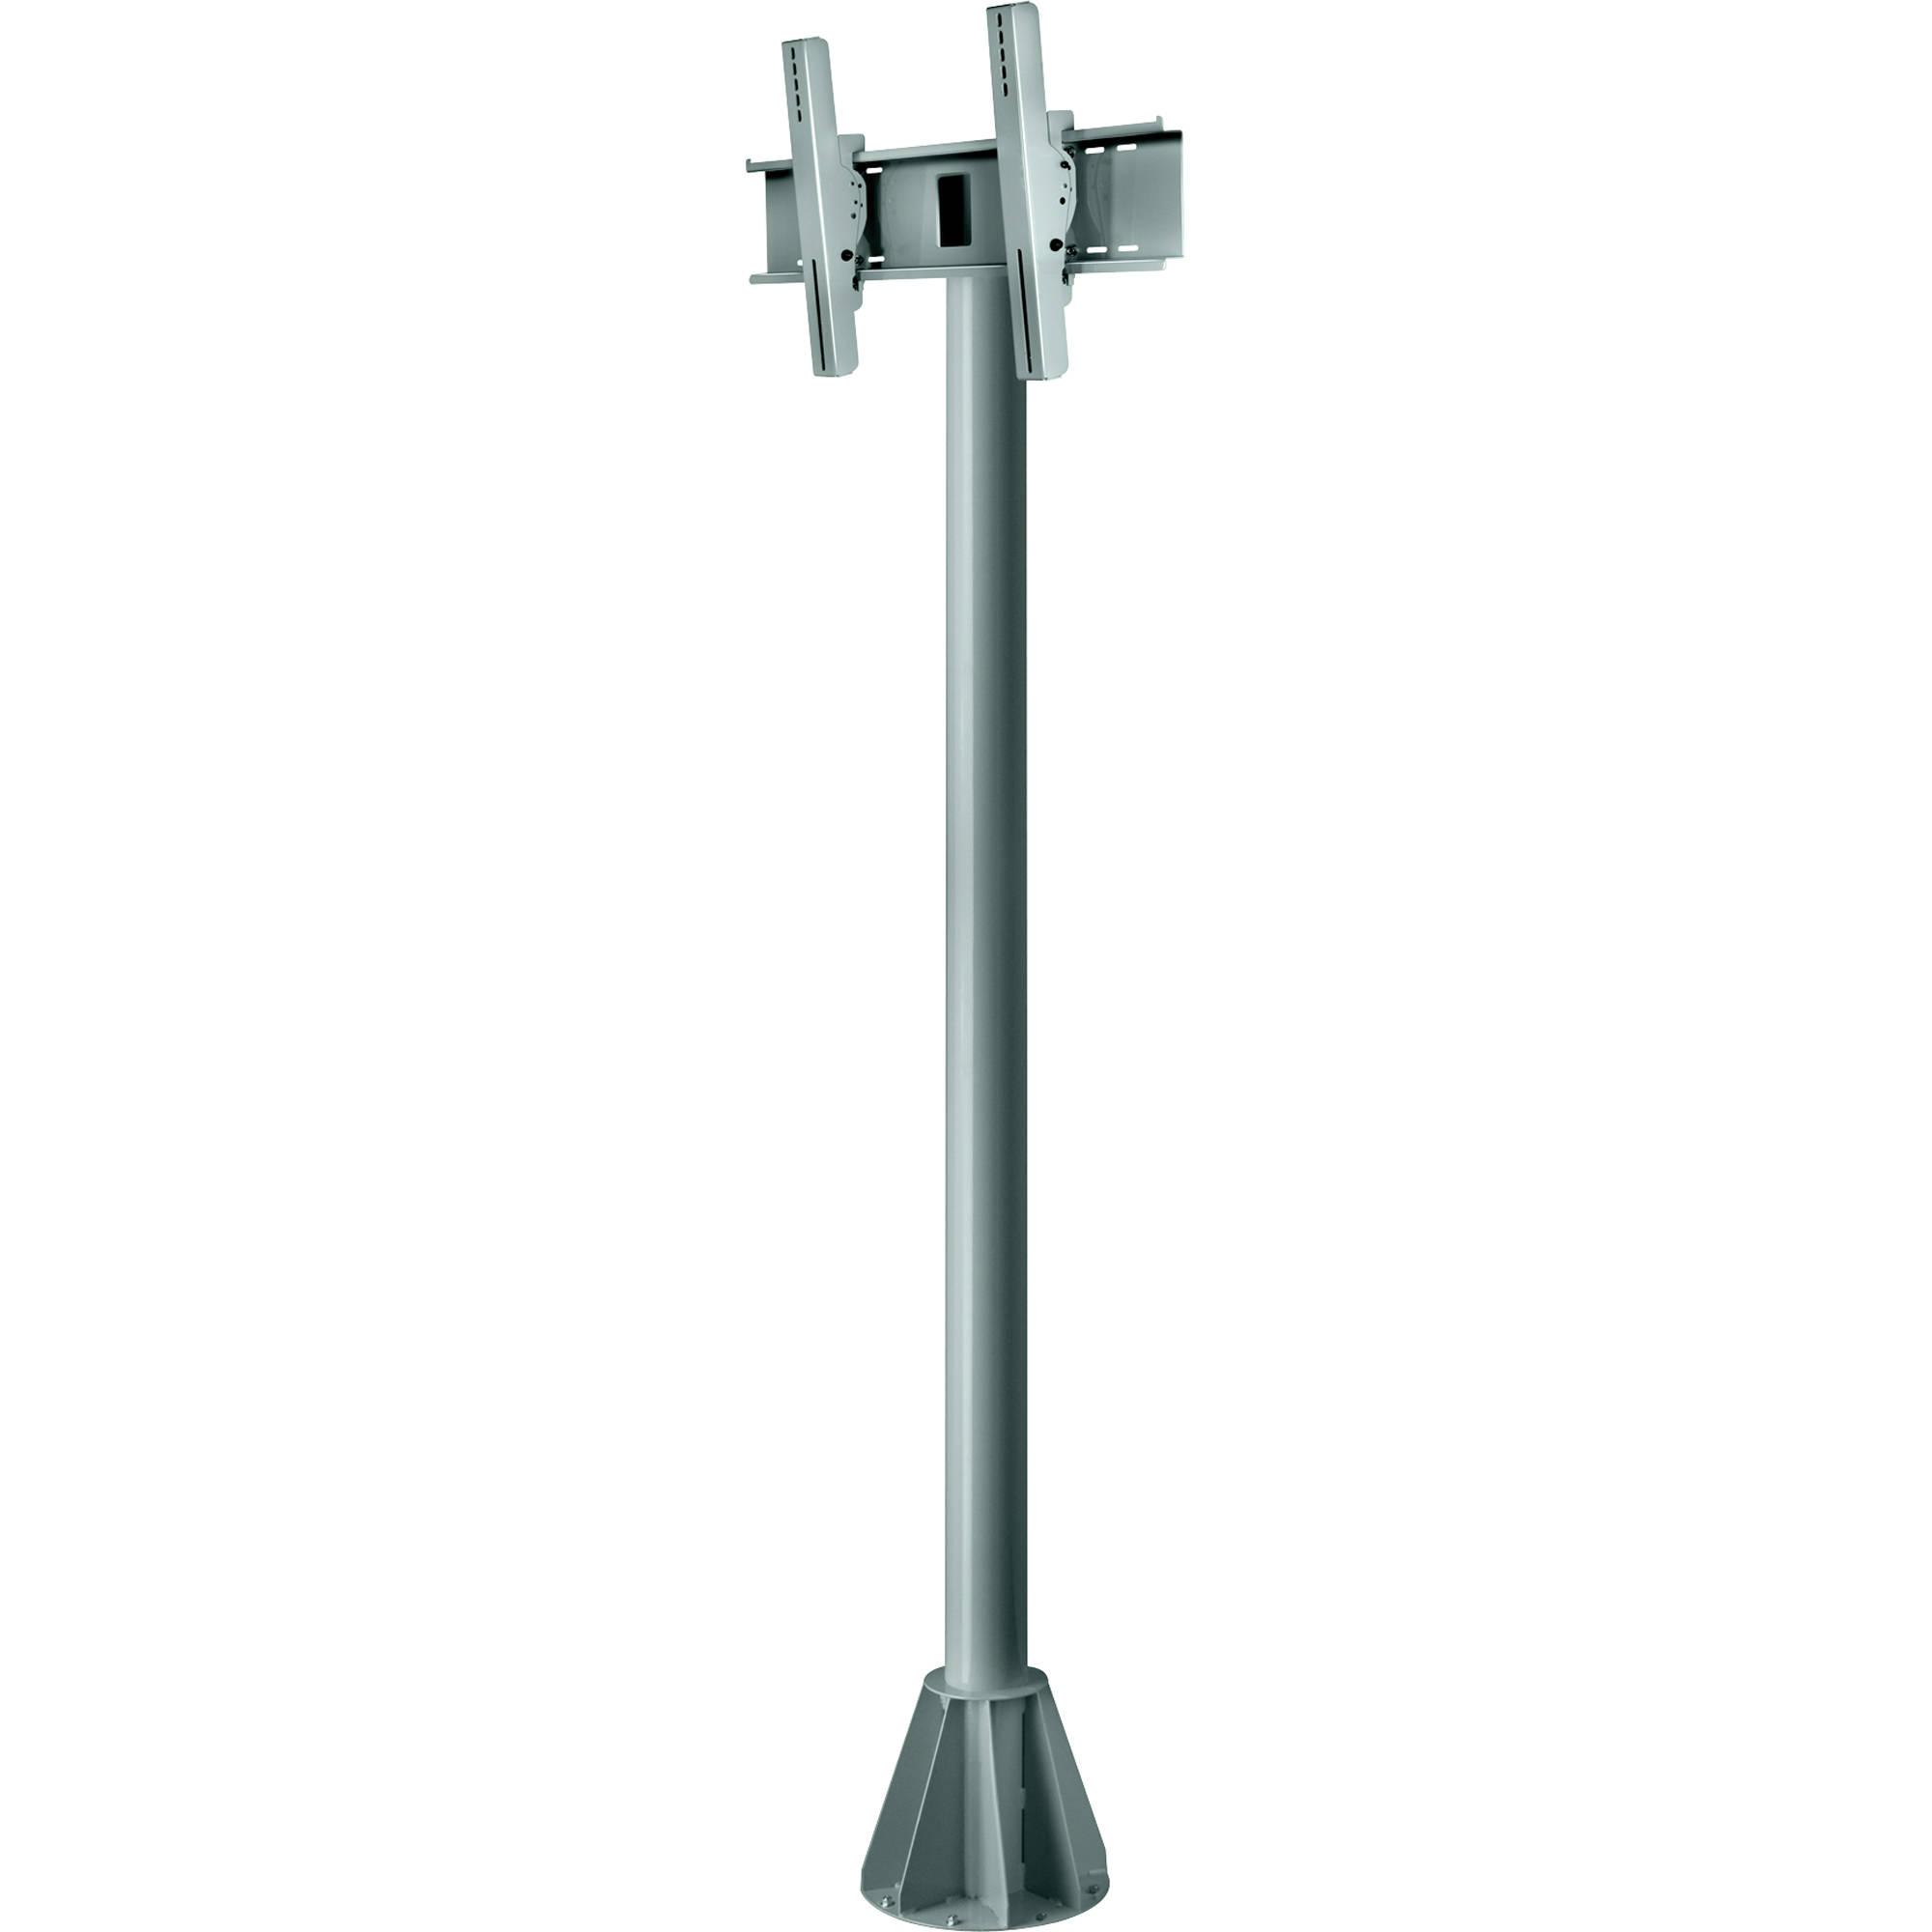 Light Pole Pedestal: Peerless-AV EPMU-07-S Wind Rated Pedestal Tilt Mount EPMU-07-S